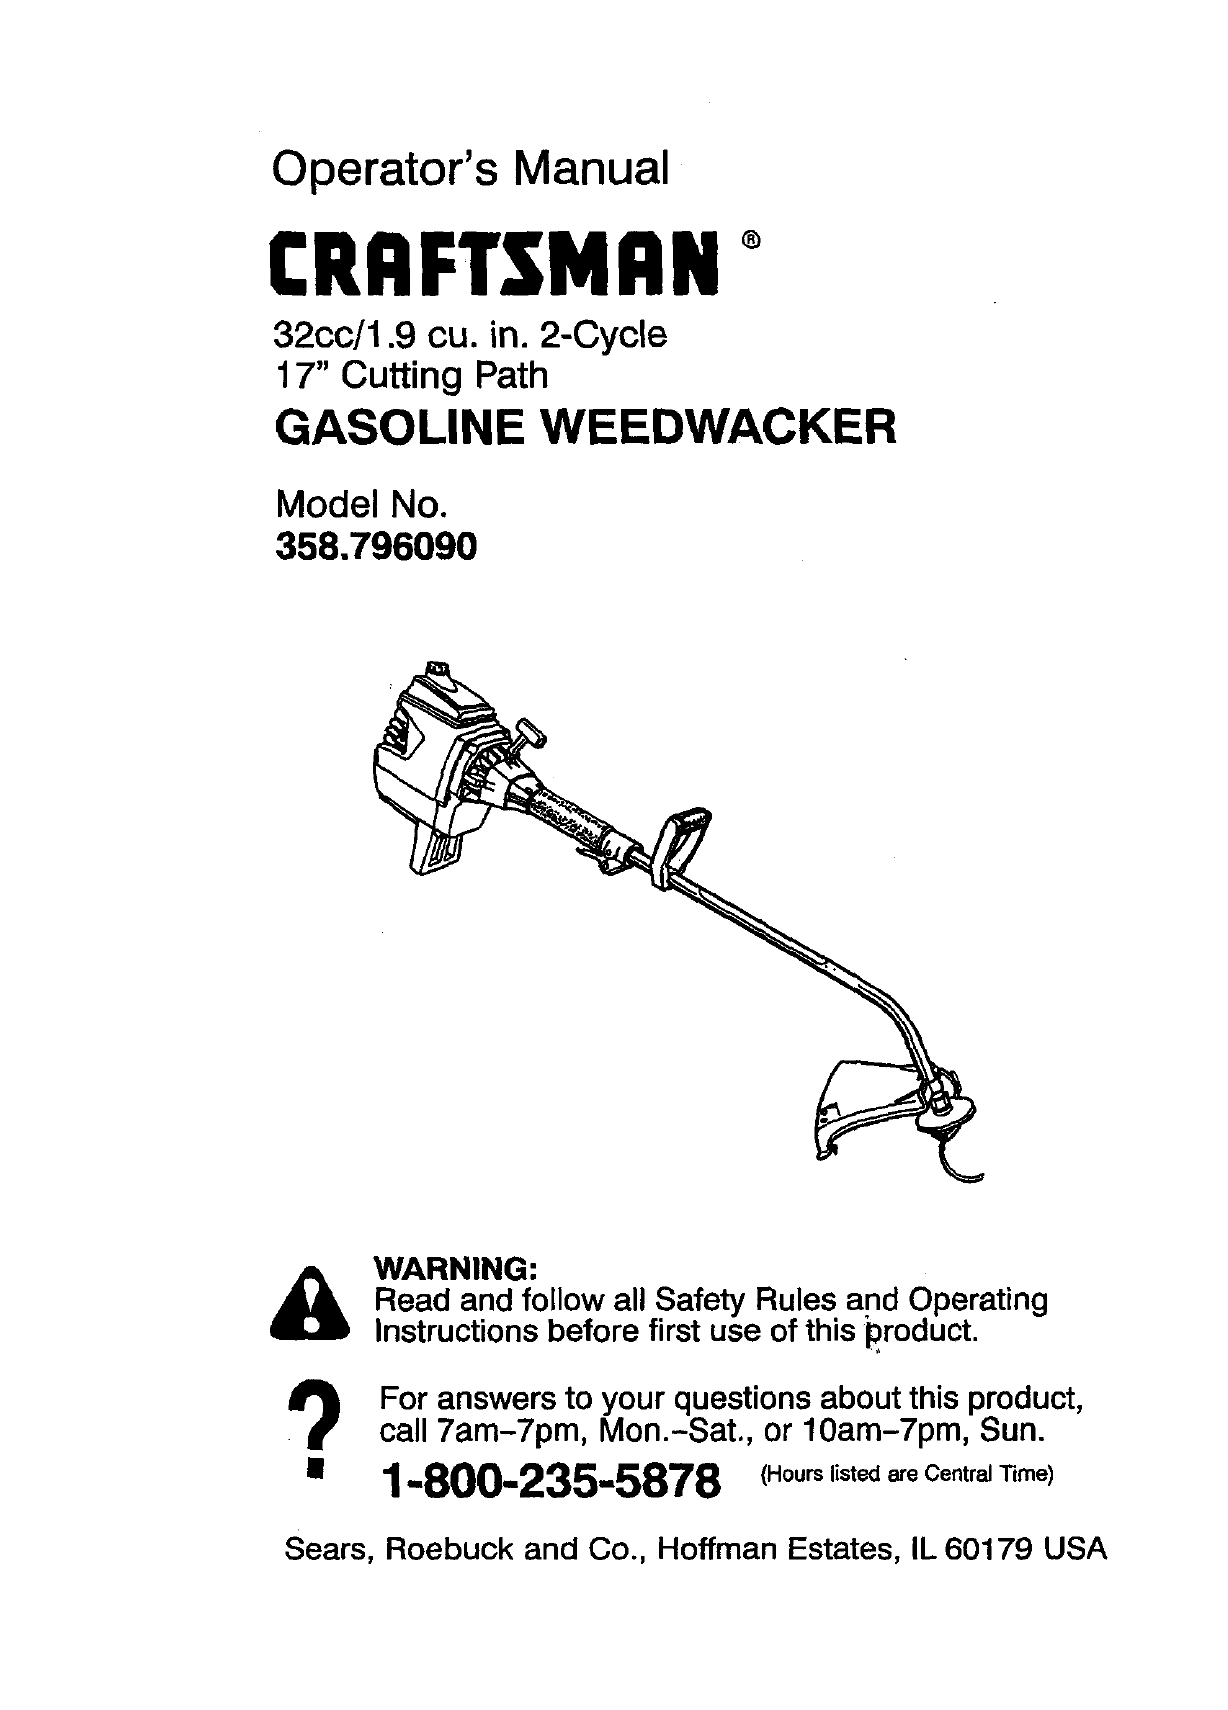 Craftsman 358796090 User Manual GASOLINE WEEDWACKER Manuals And